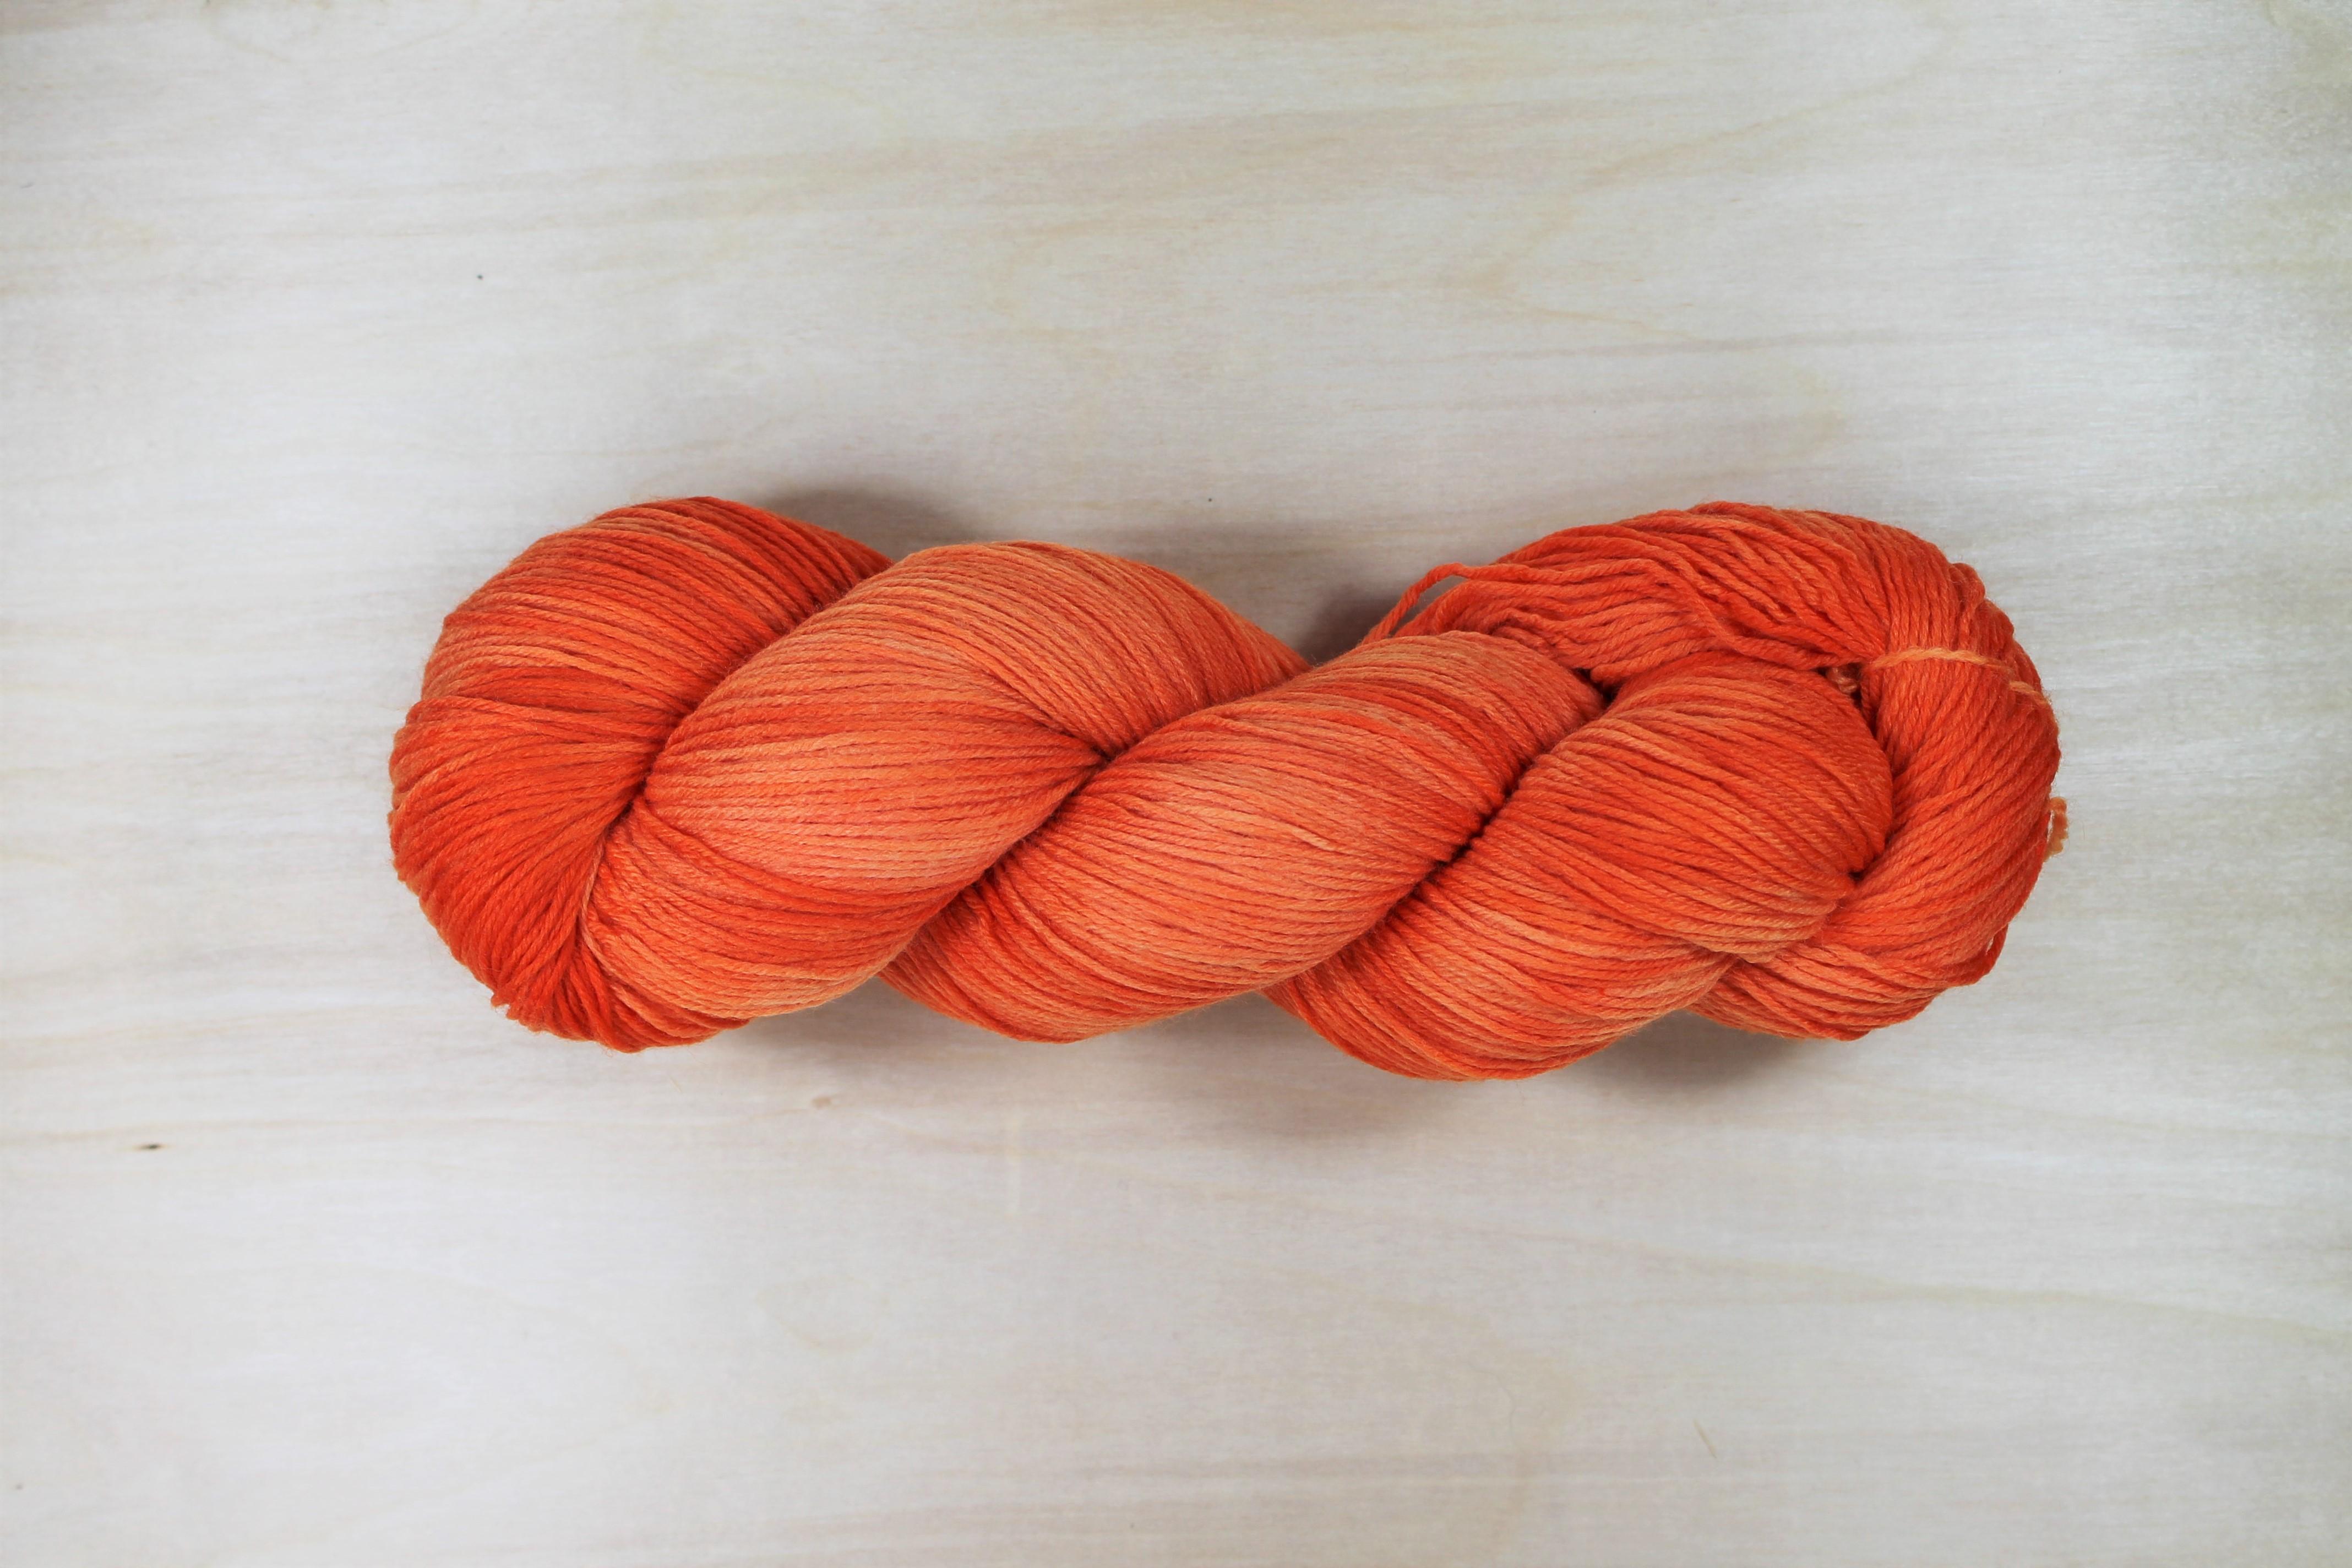 #0003 - Kooky Orange